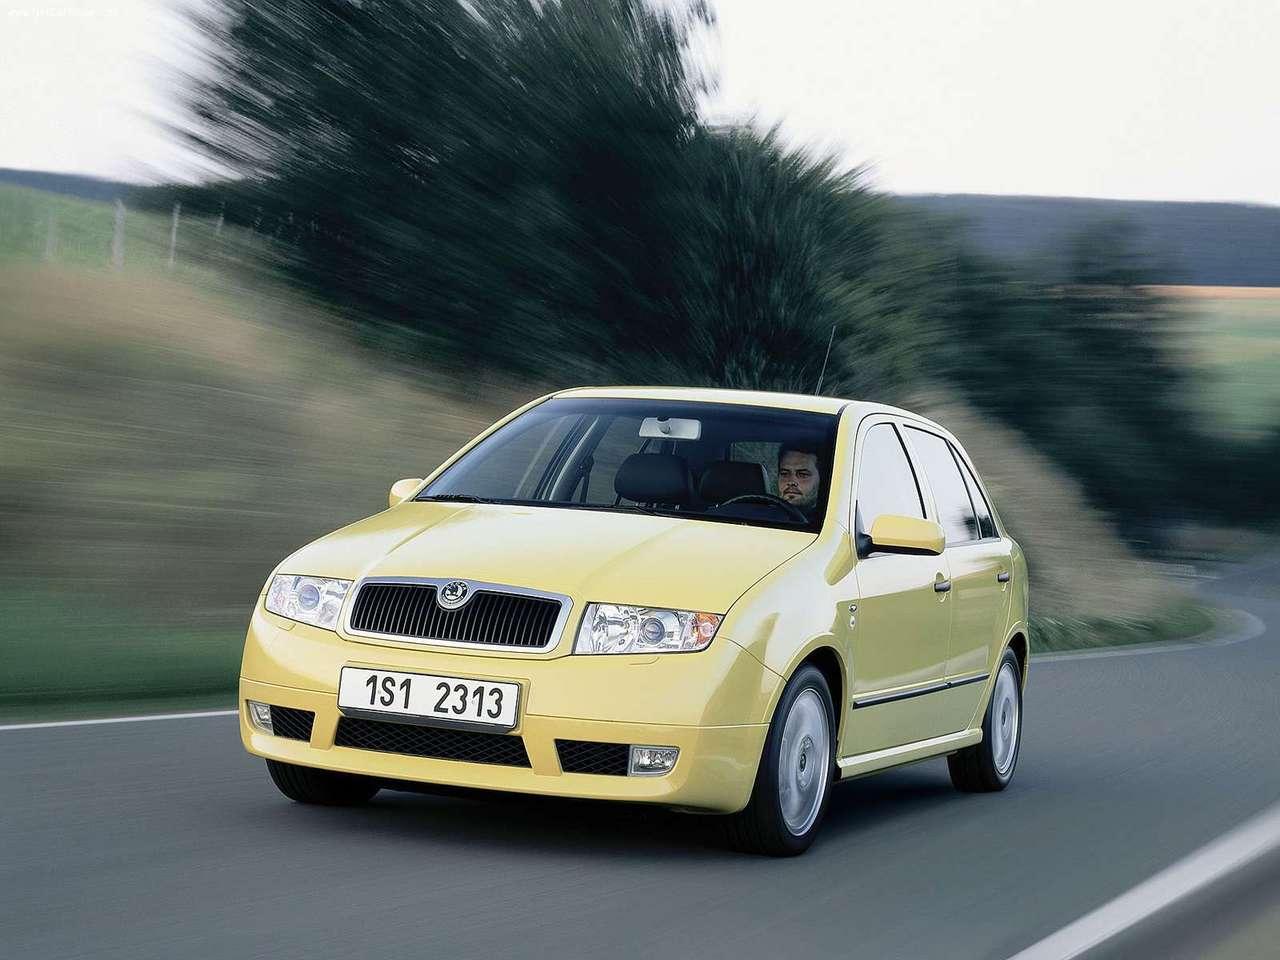 2003 Skoda Fabia Skoda Cars